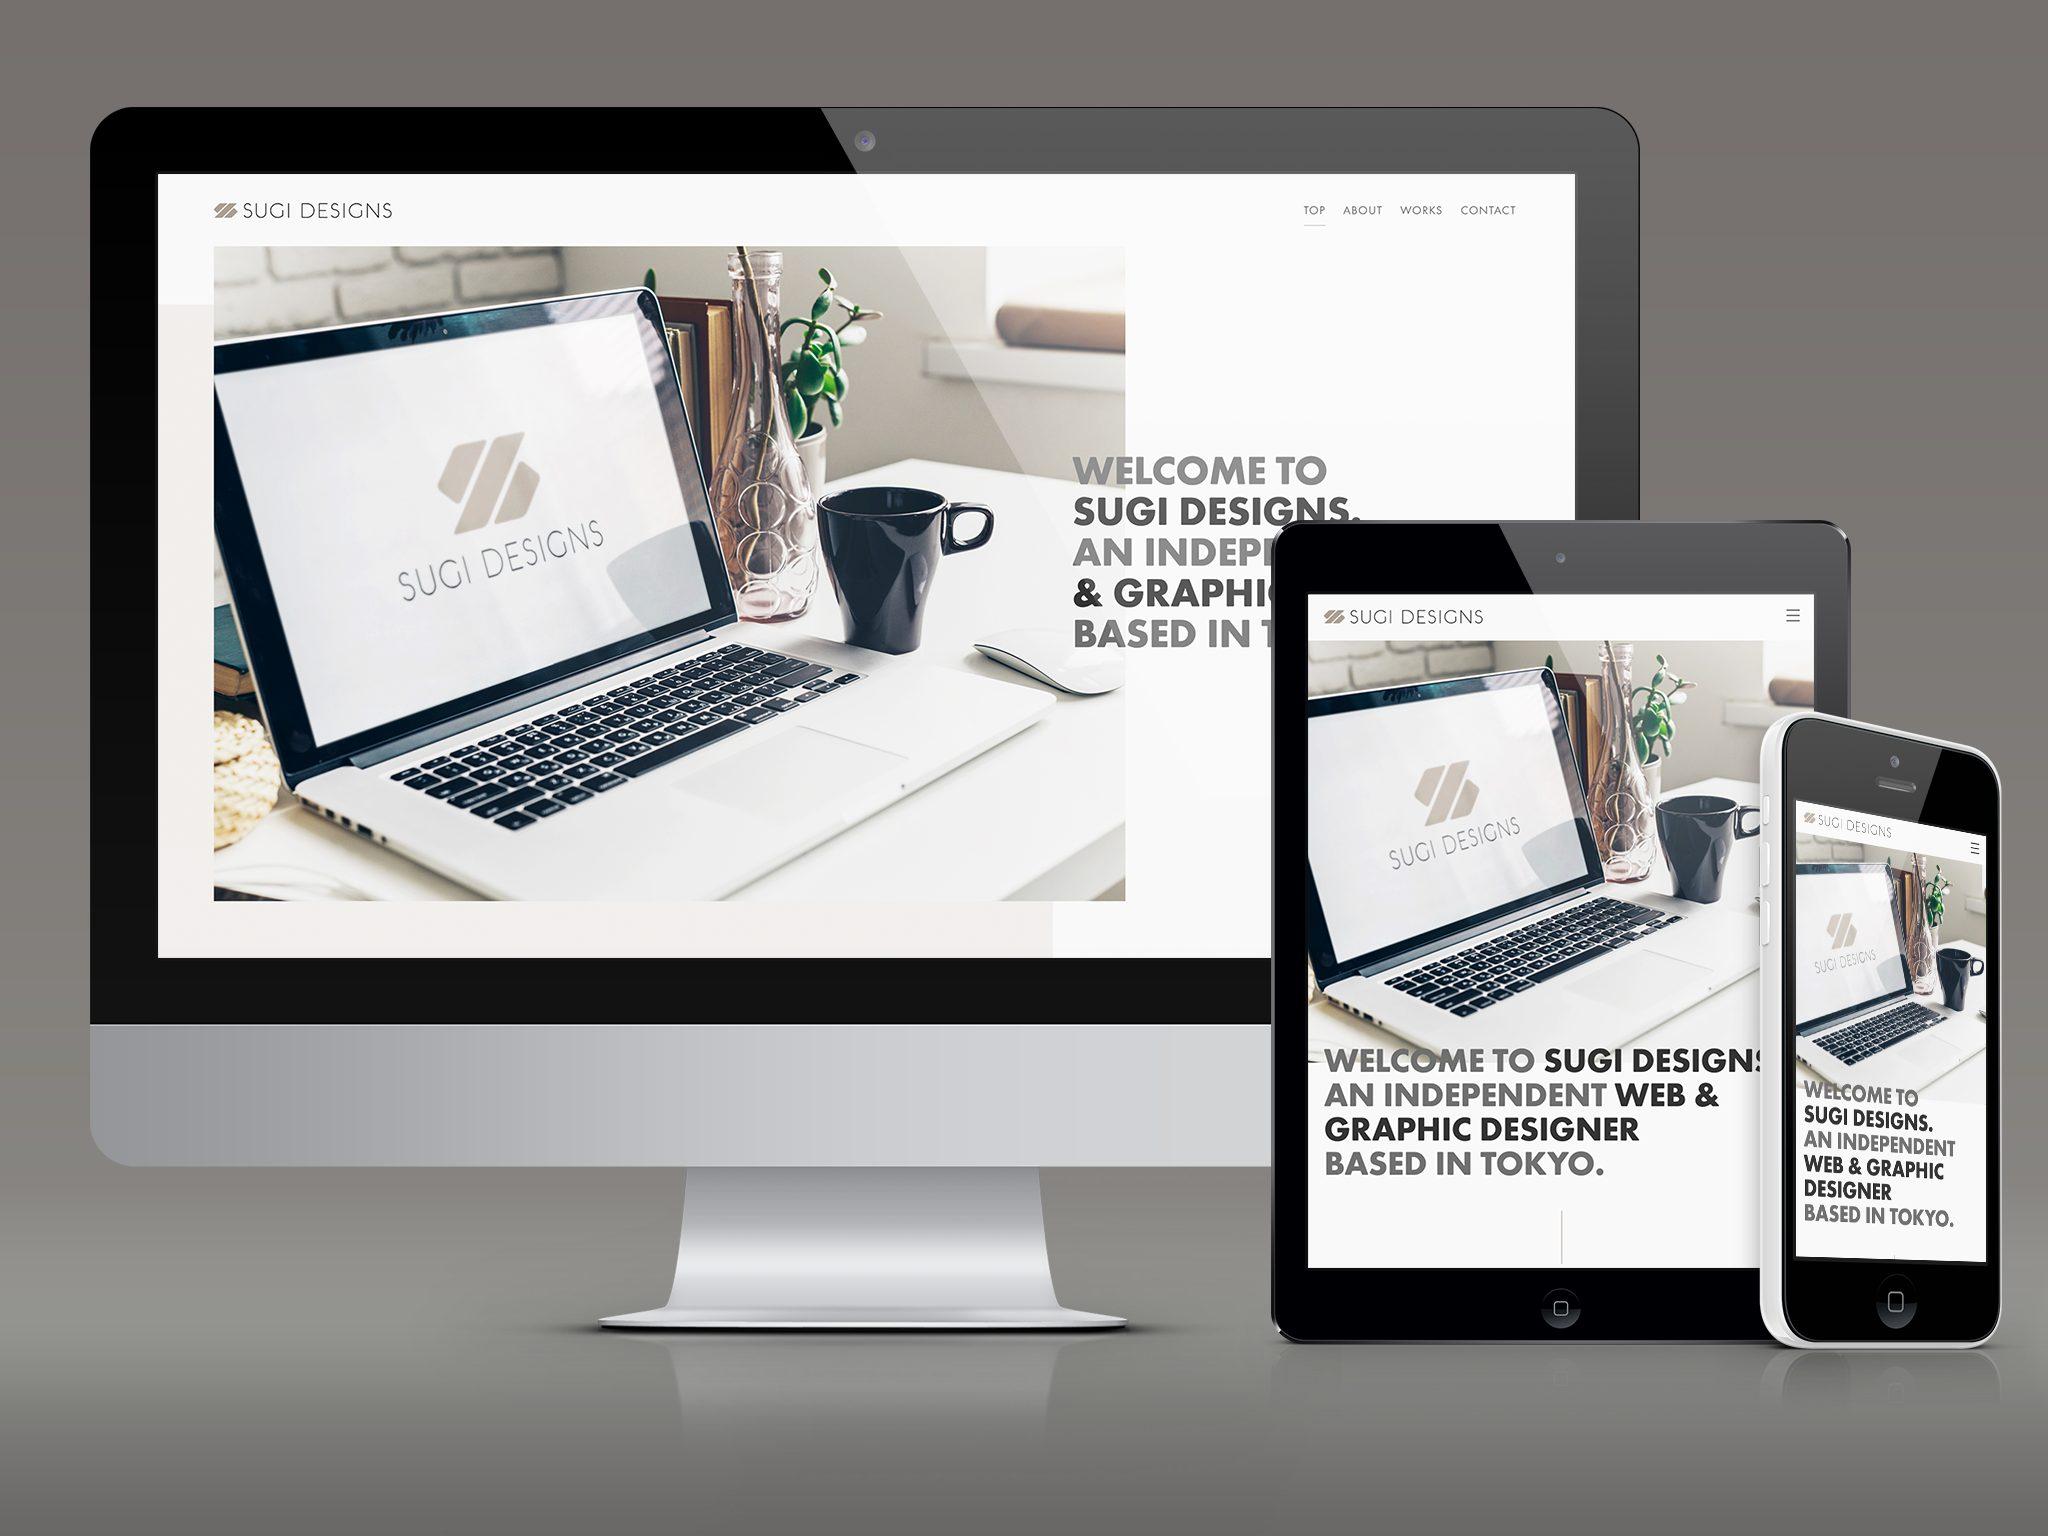 SUGI DESIGNS WEB SITE RENEWAL